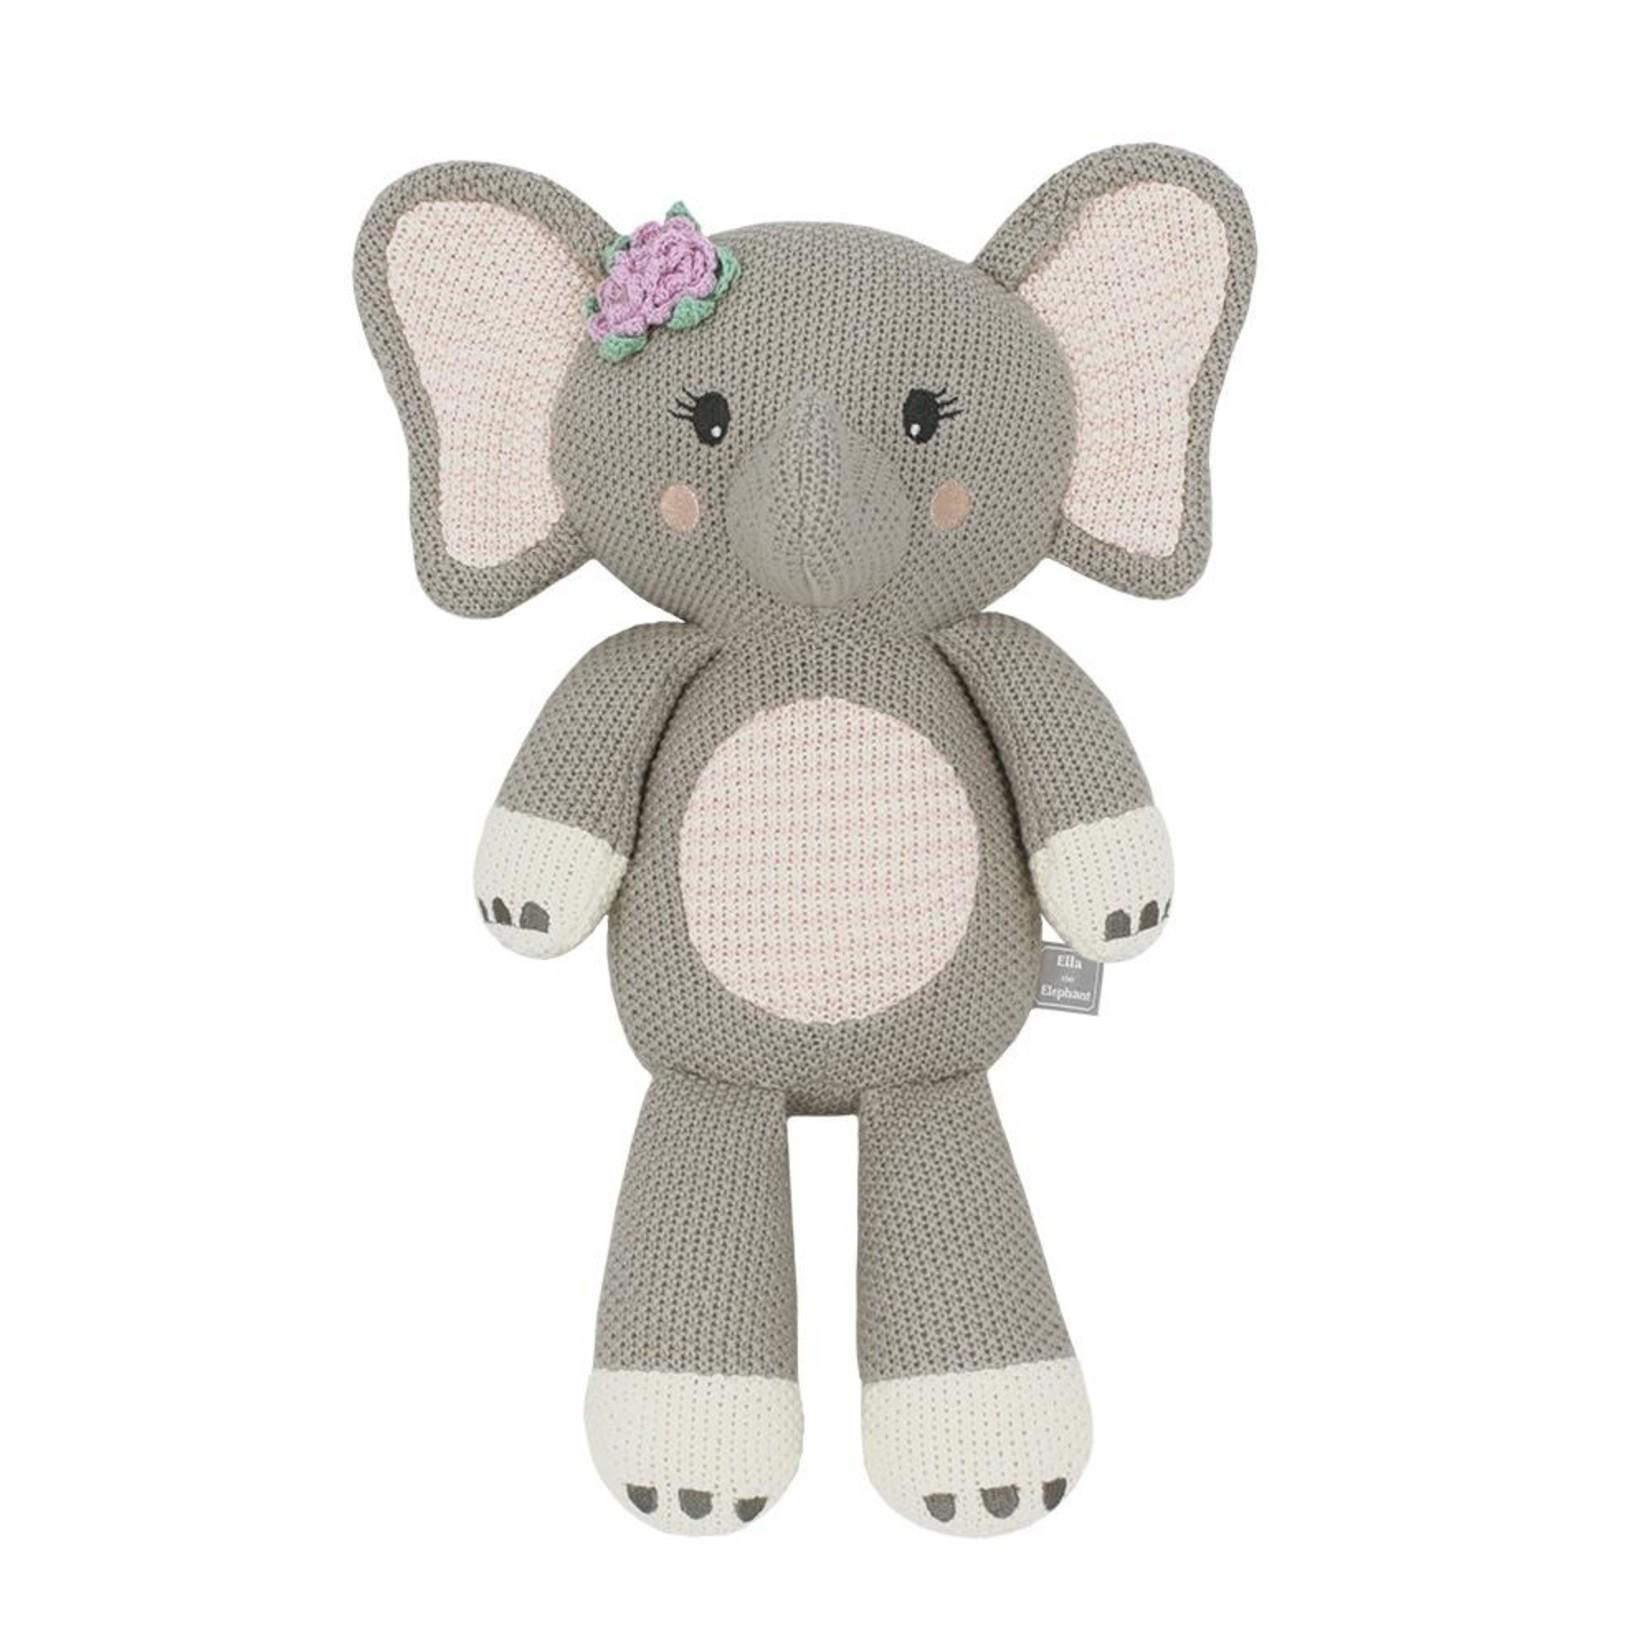 Living Textiles Living Textiles Whimsical Toy - Ella the Elephant